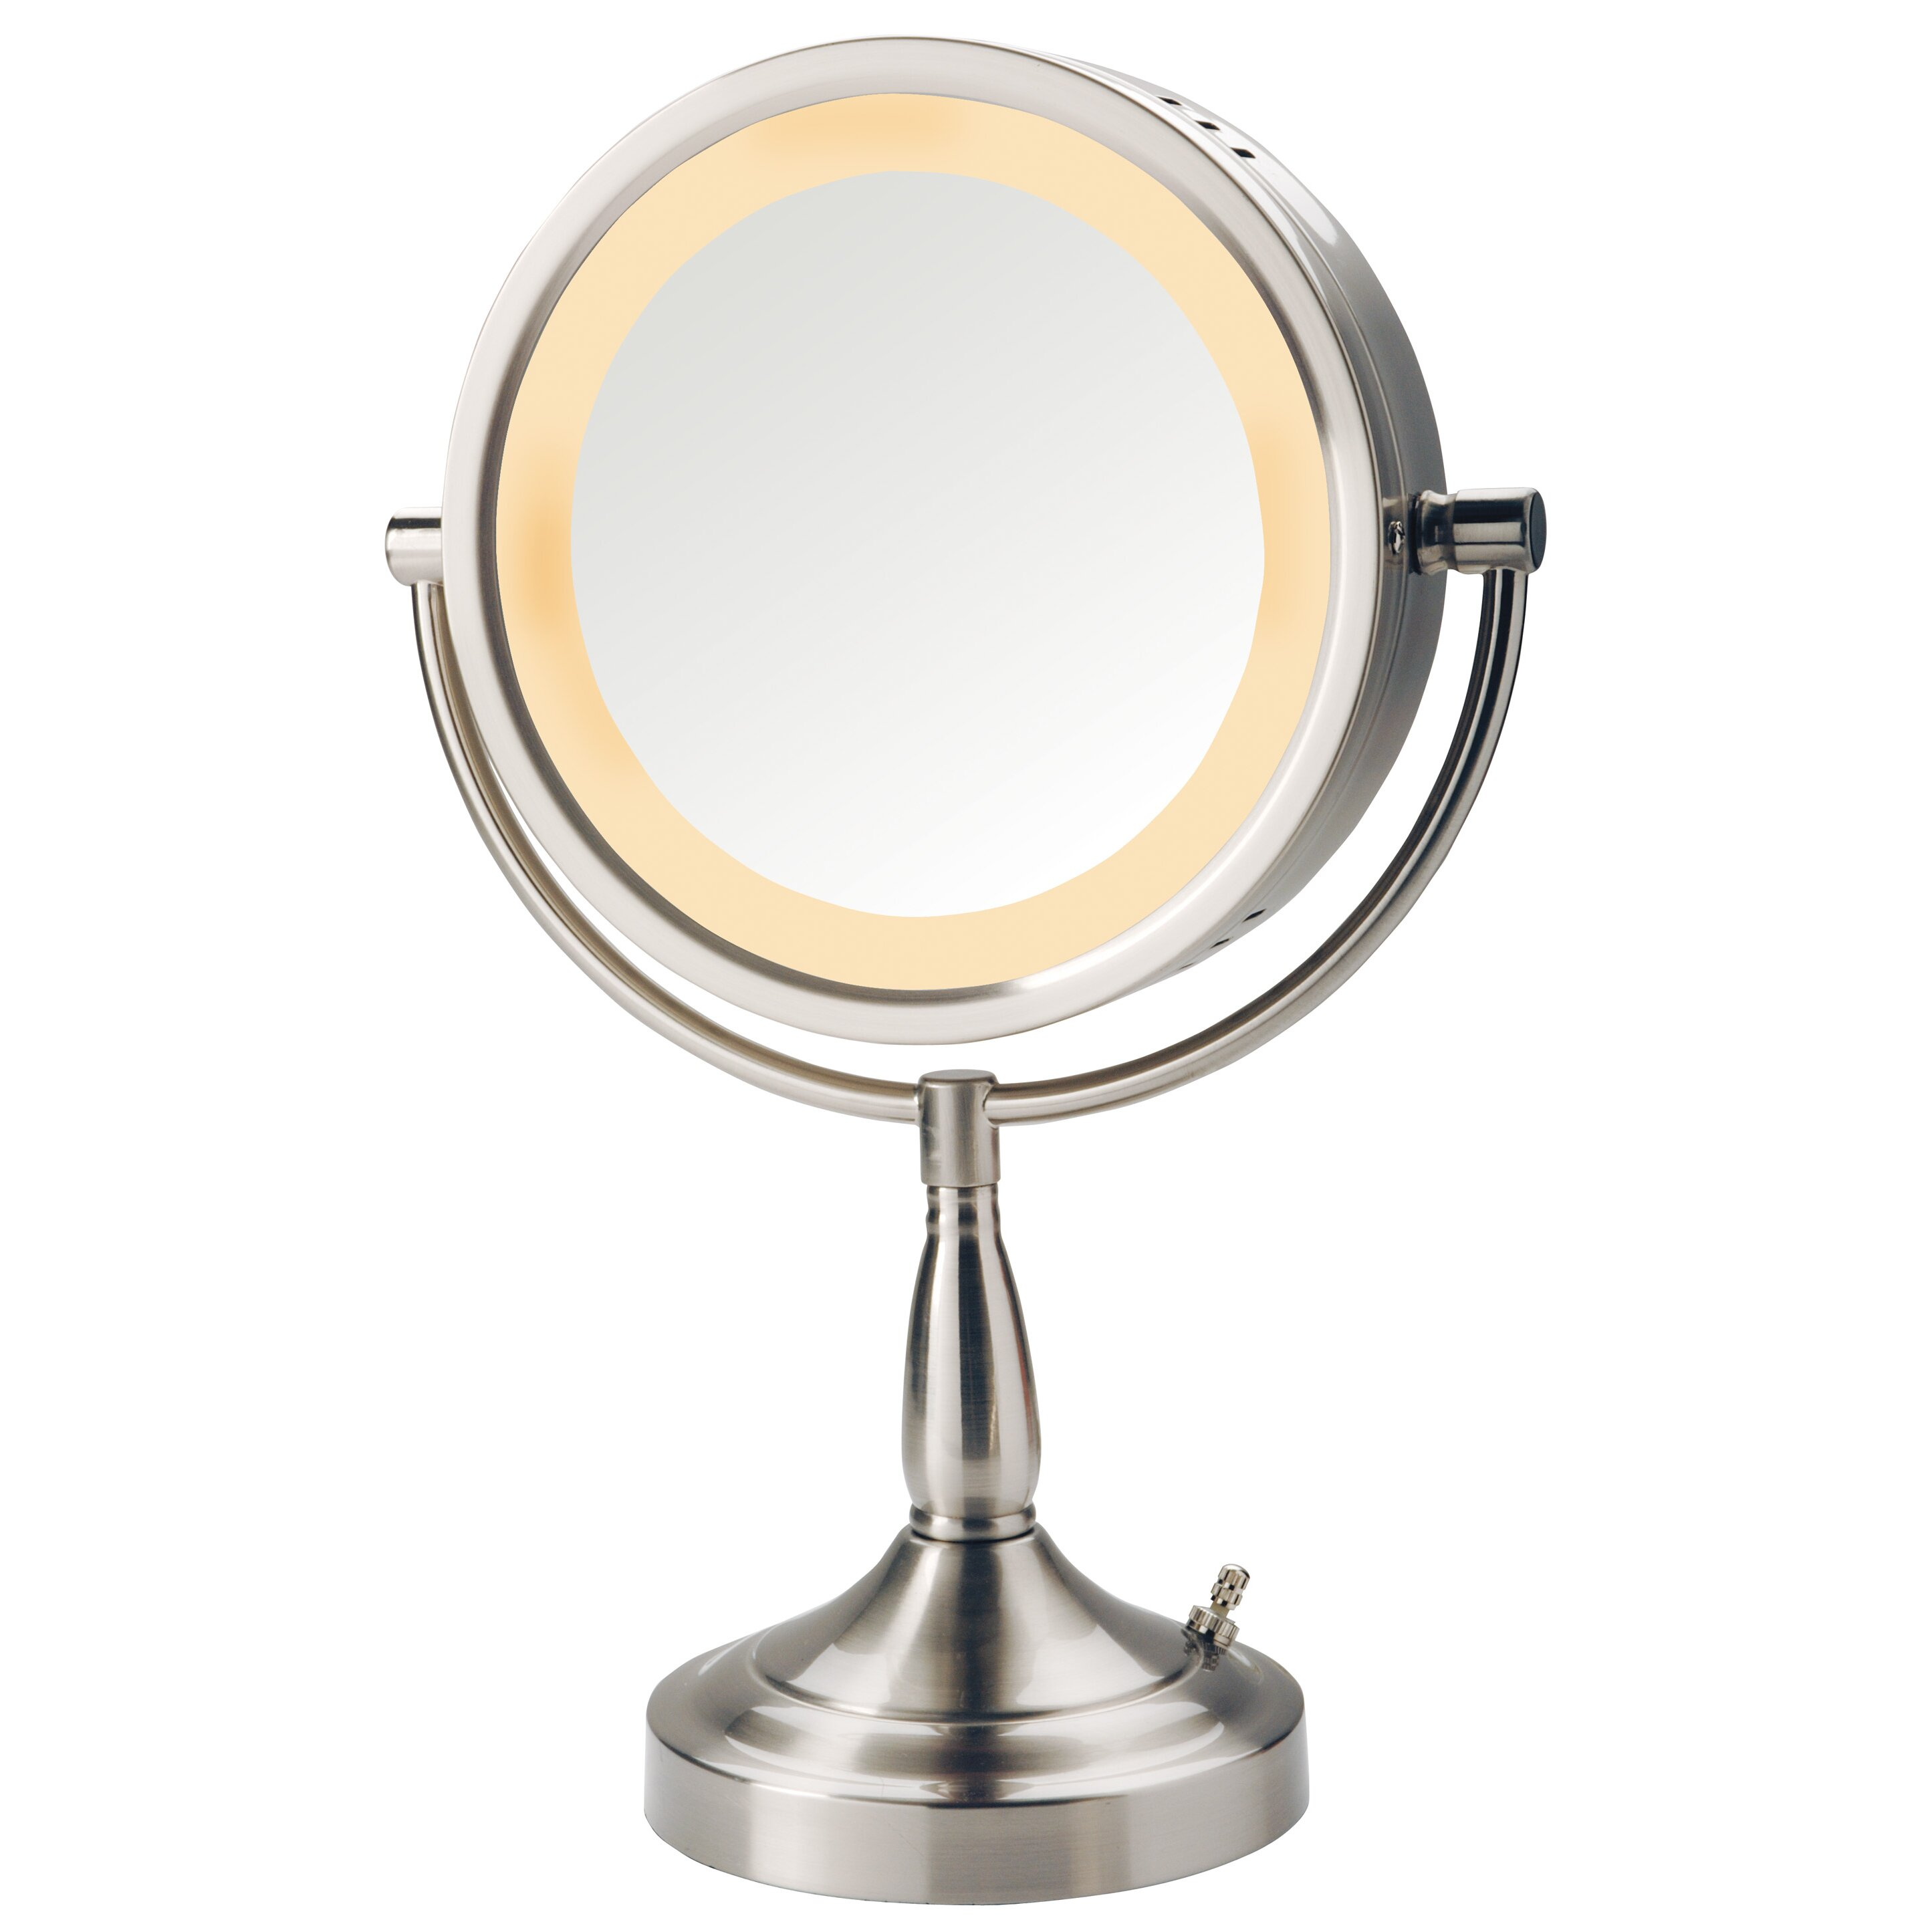 darby home co lighted vanity mirror reviews wayfair